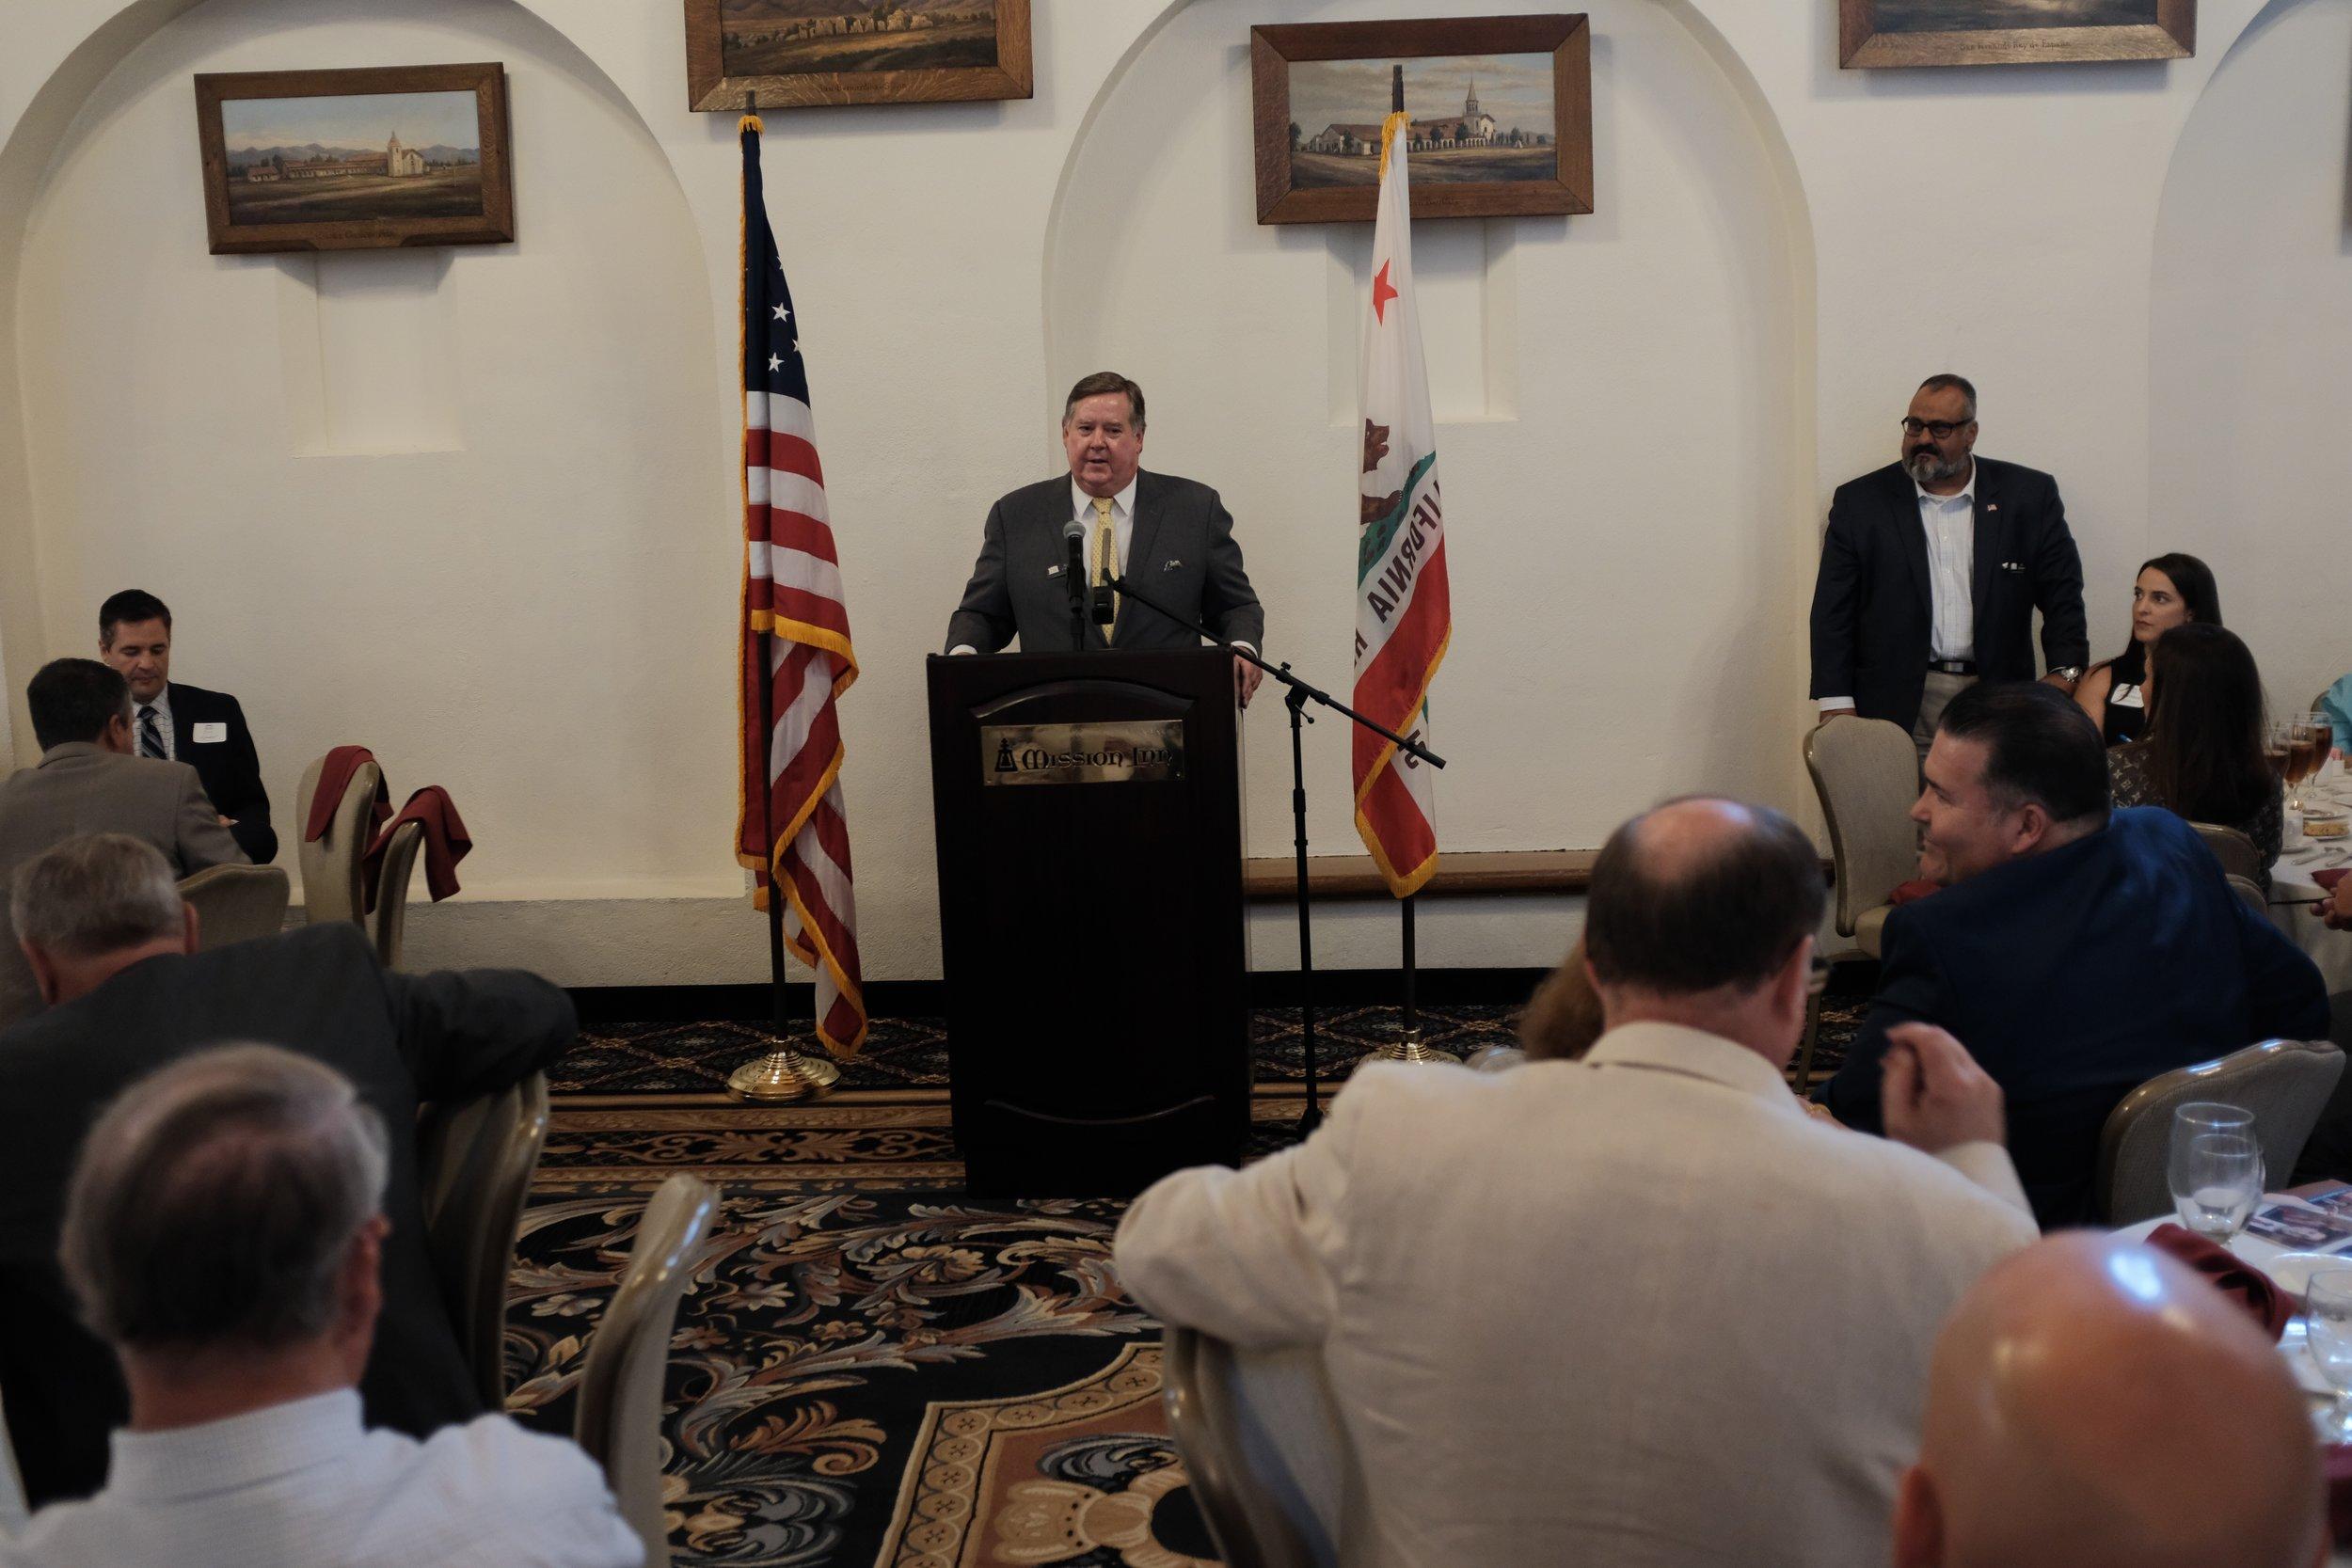 Congressman Ken Calvert speaking at today's Lincoln Club Meeting.